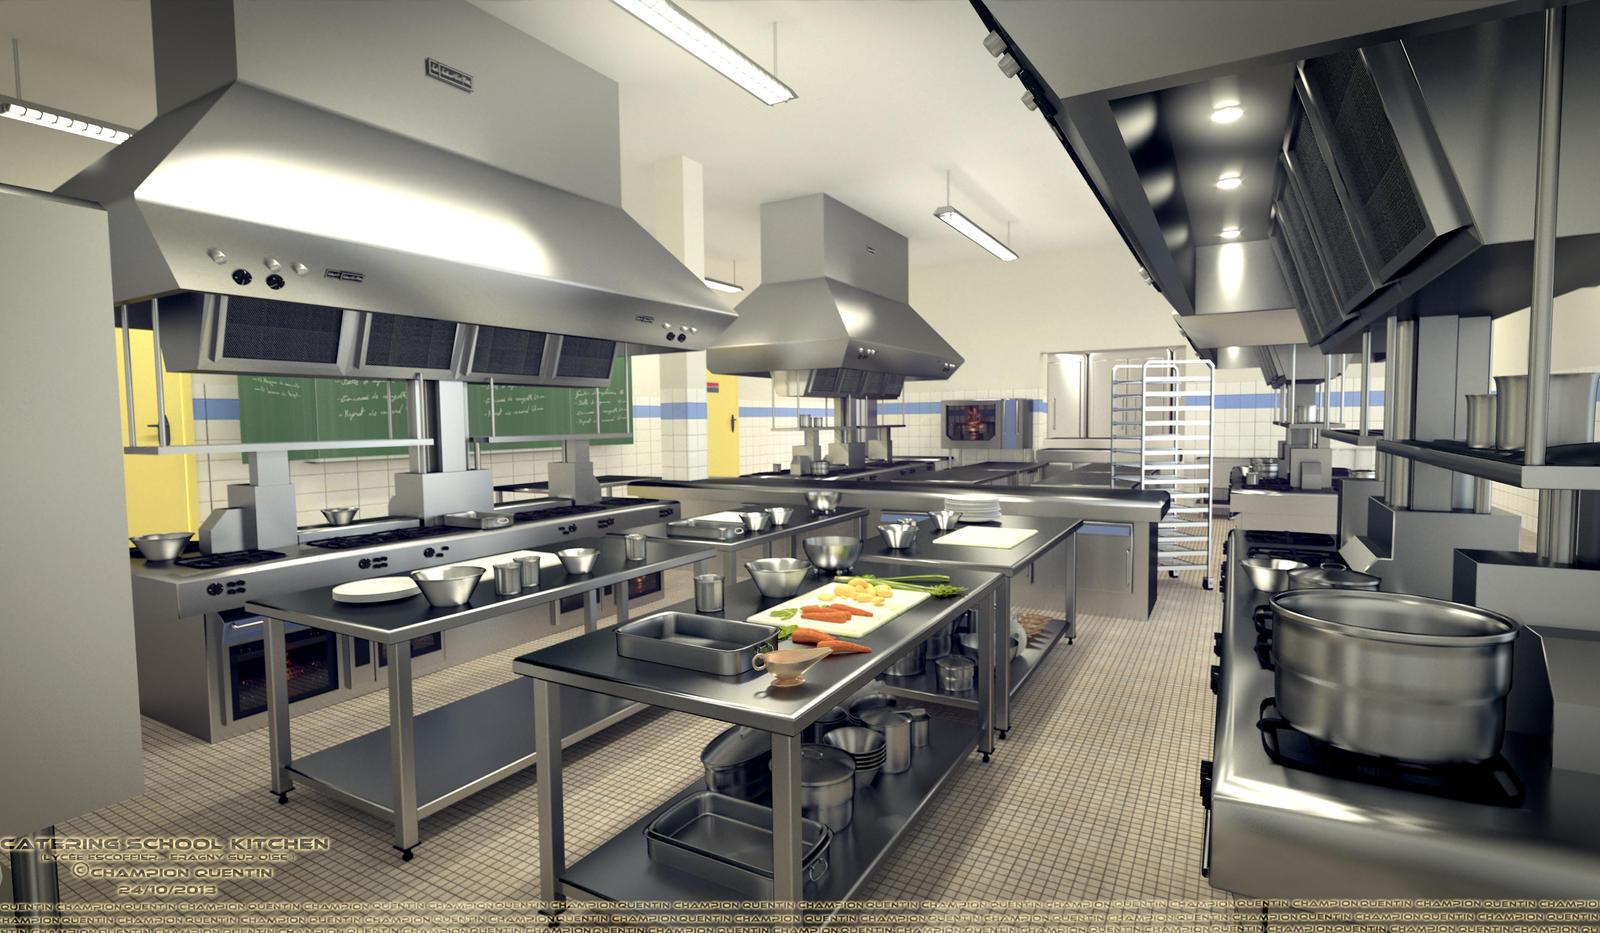 Charmant Kitchen Of Catering School Escoffier By MrSvein872 Kitchen Of Catering  School Escoffier By MrSvein872